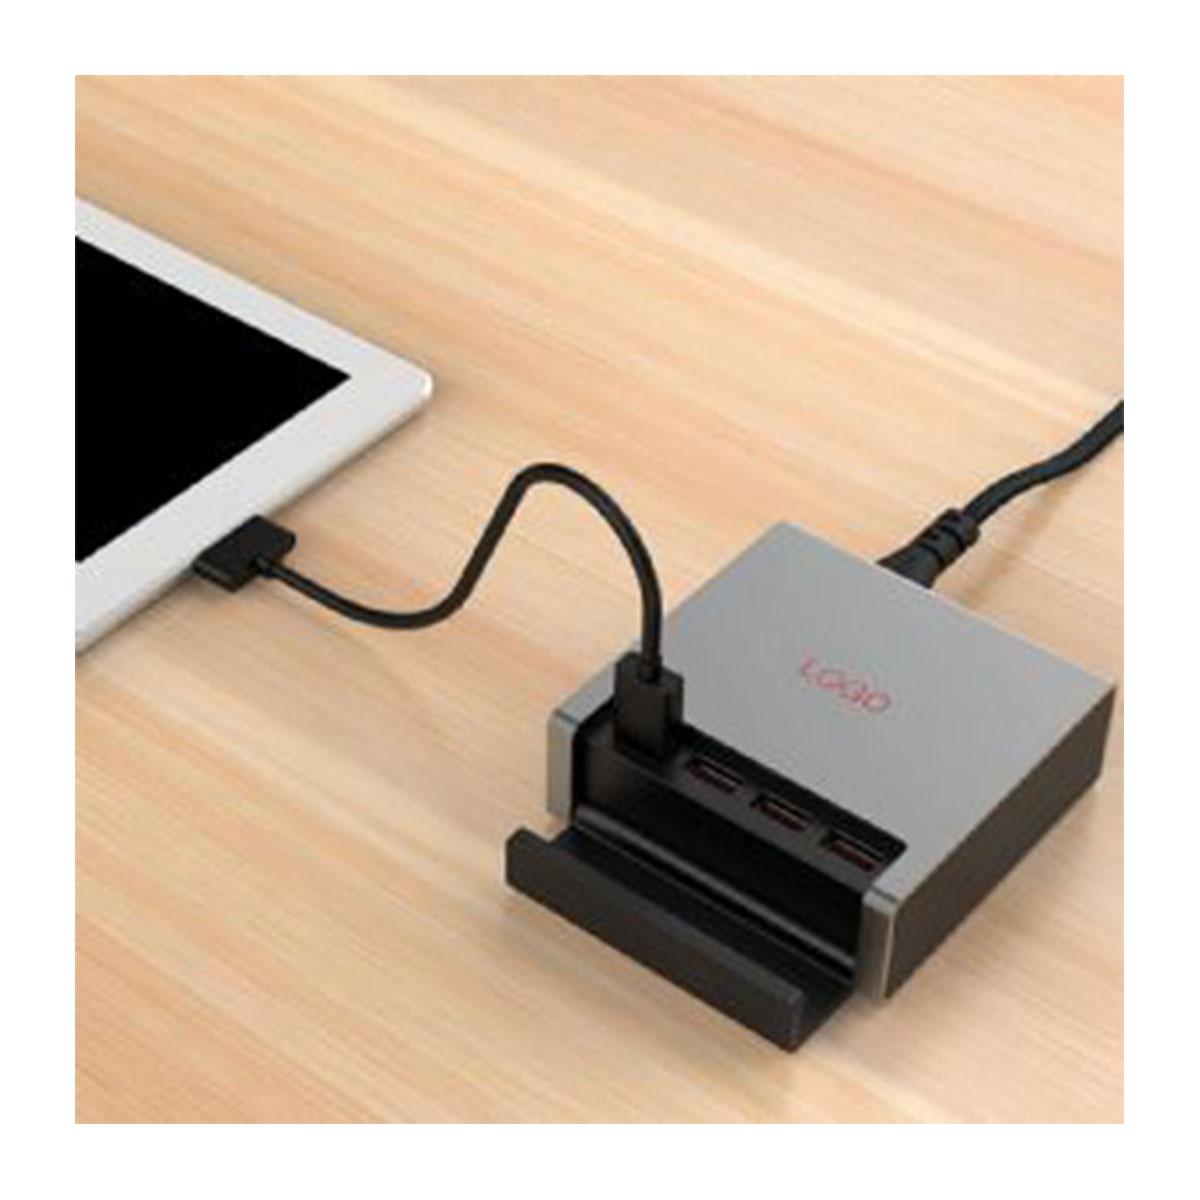 USB Smart Charger-Black